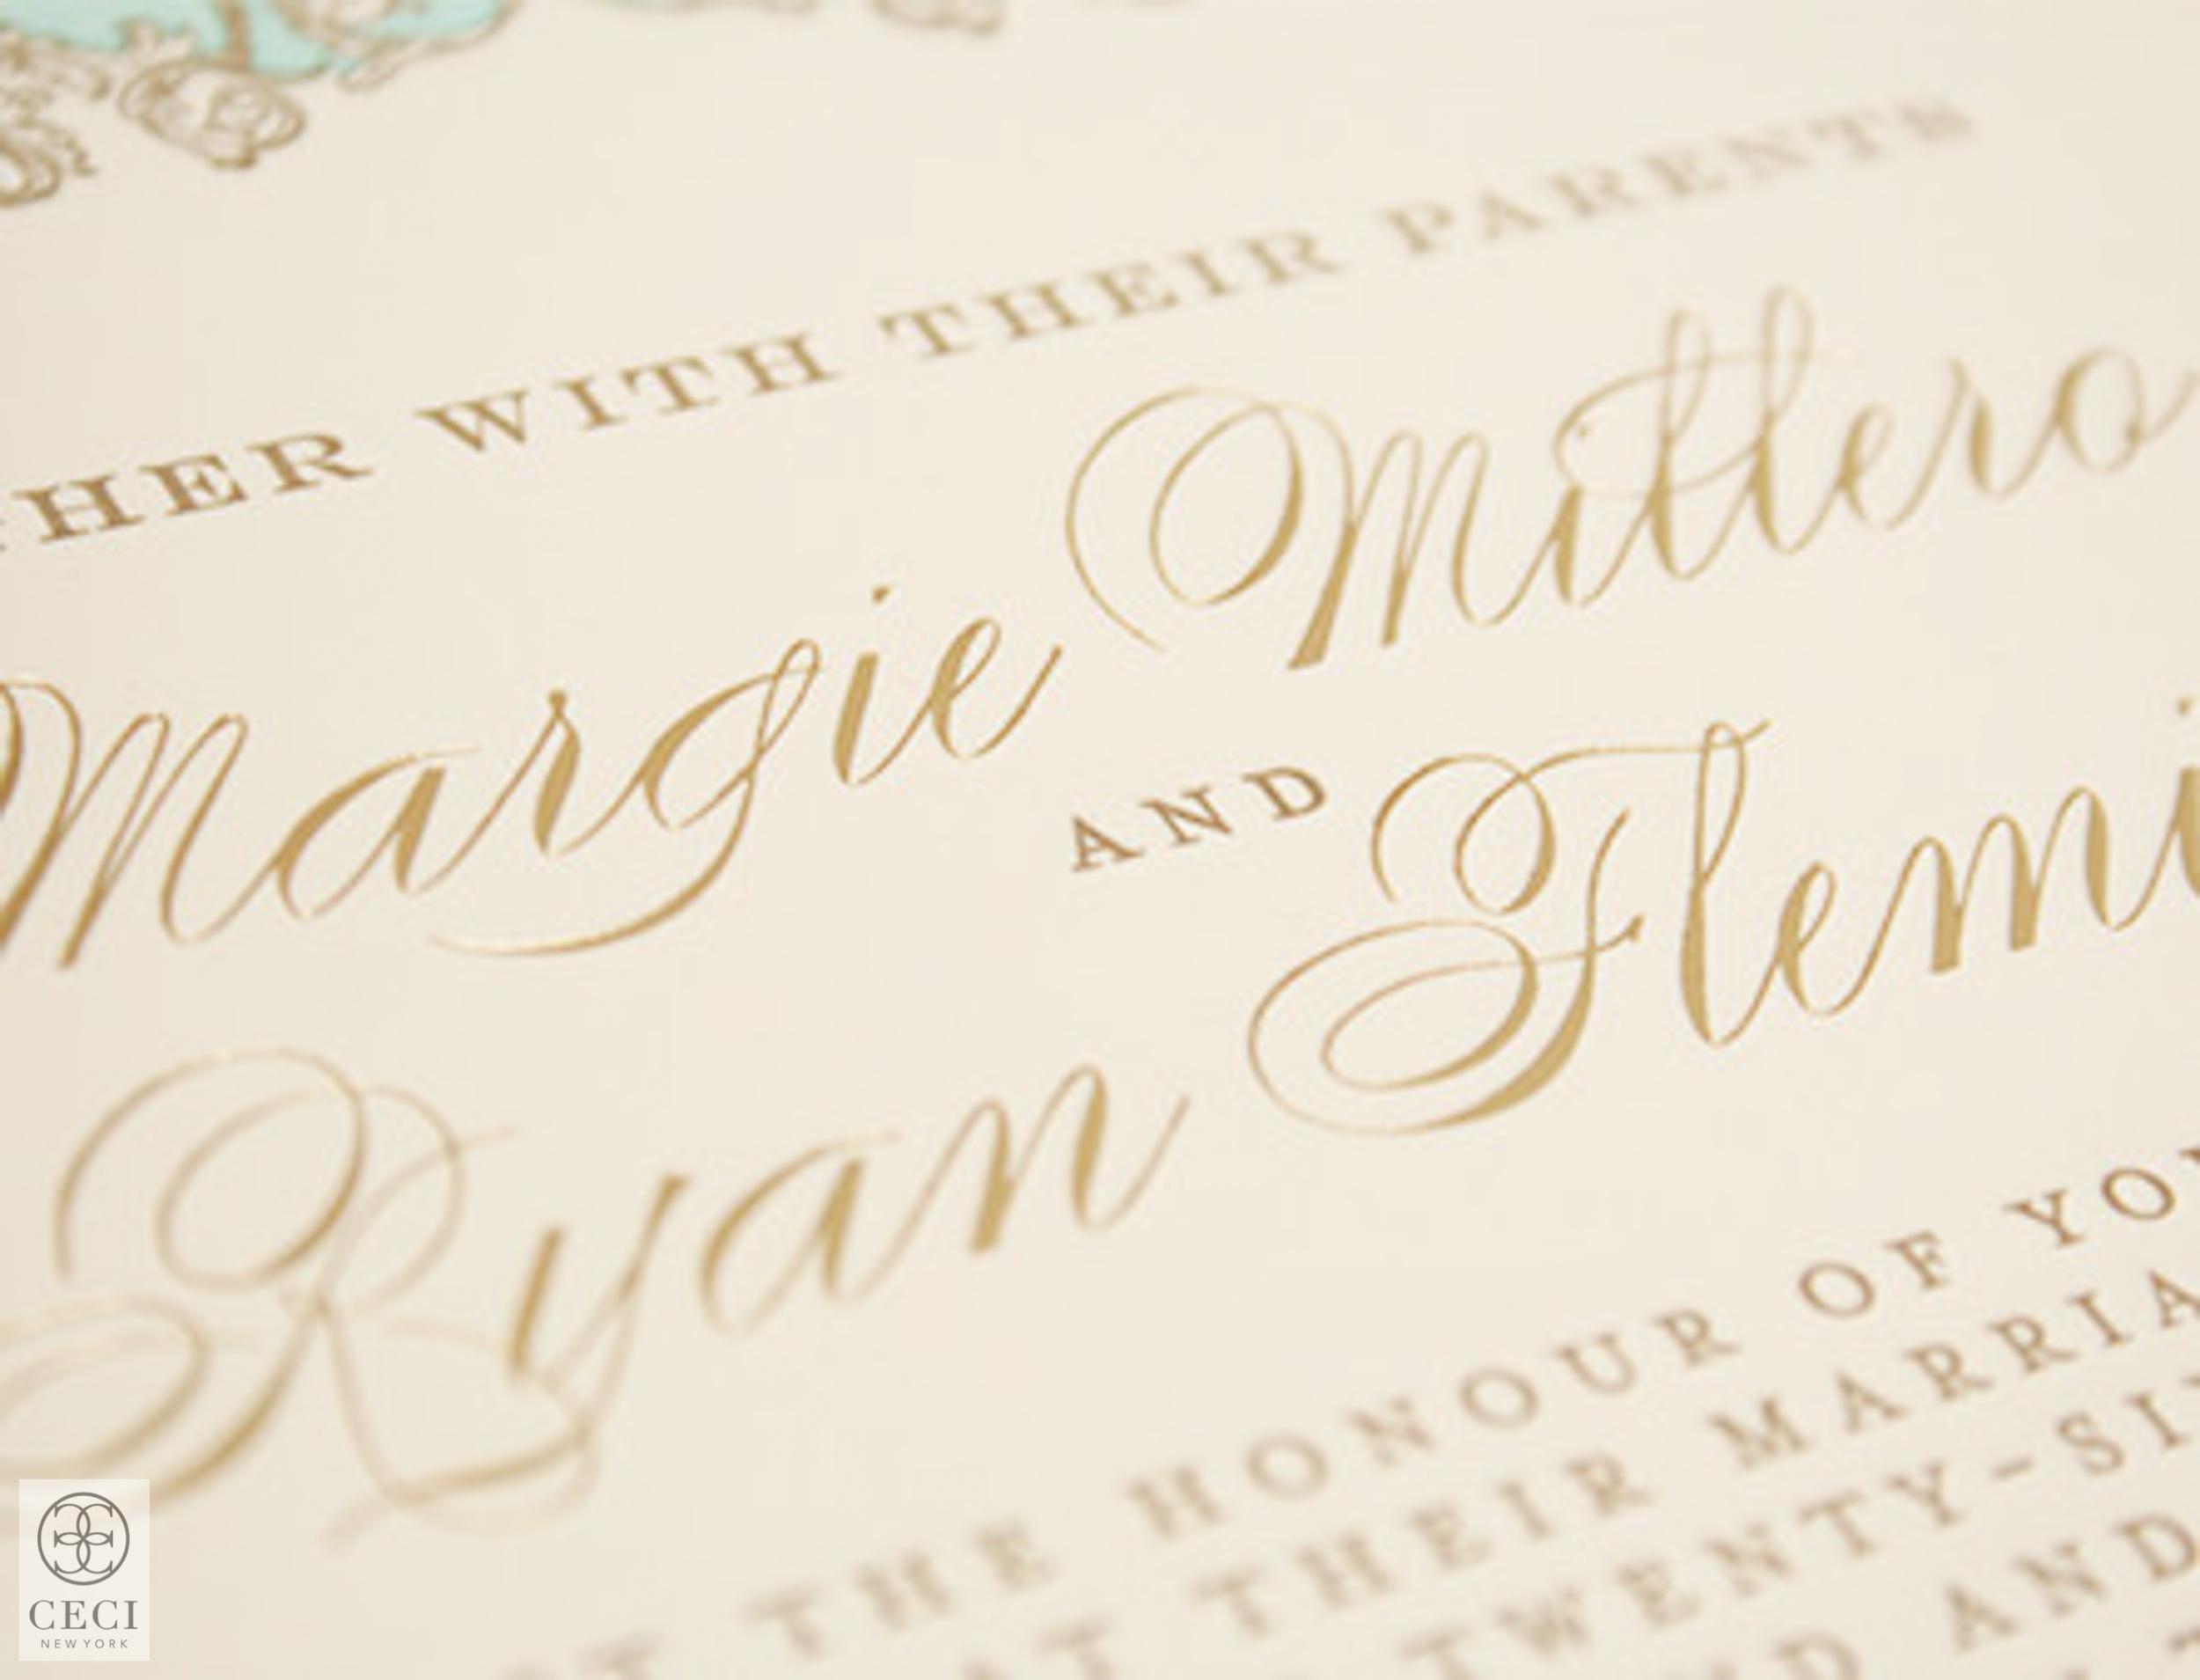 Ceci_New_York_Wedding_Lake_Como_Italy_Luxury_Style_Custom_Invitation-7.jpg